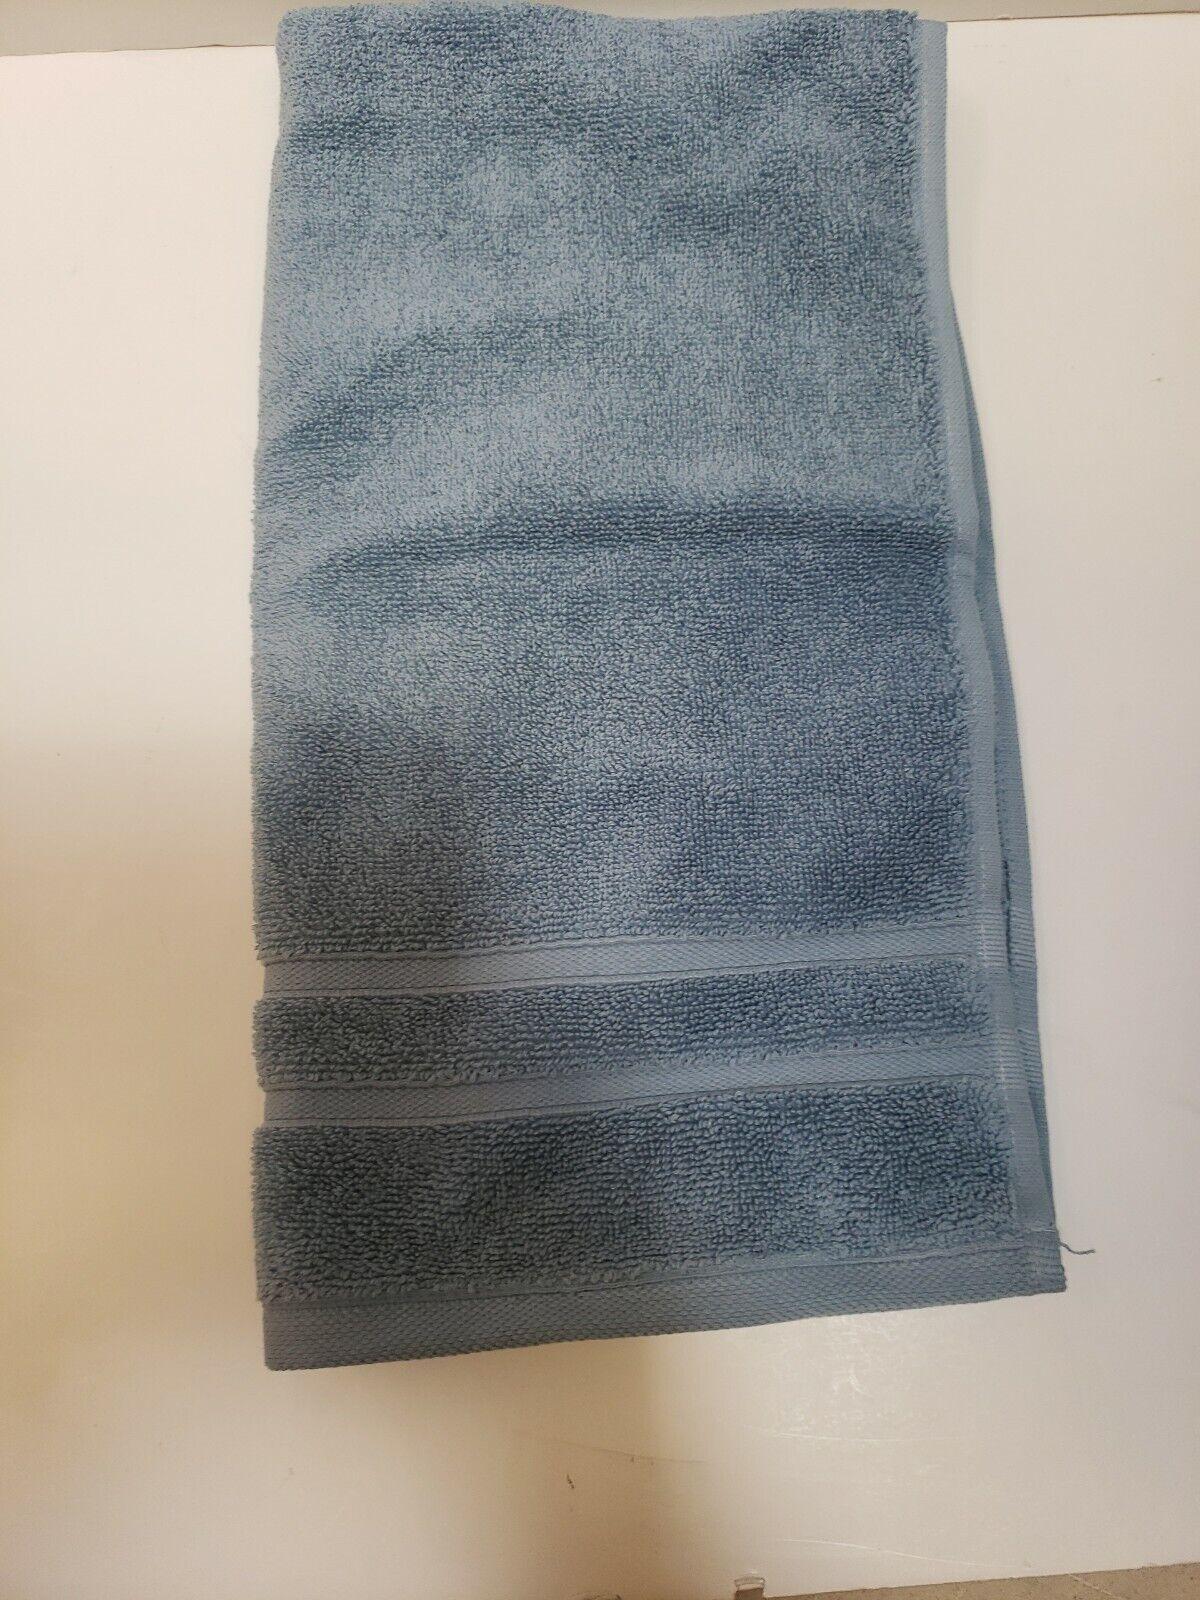 Waterworks Studio Bath Cotton Edisto Blue Hand Bath Towel blue 16 x 30 Inch